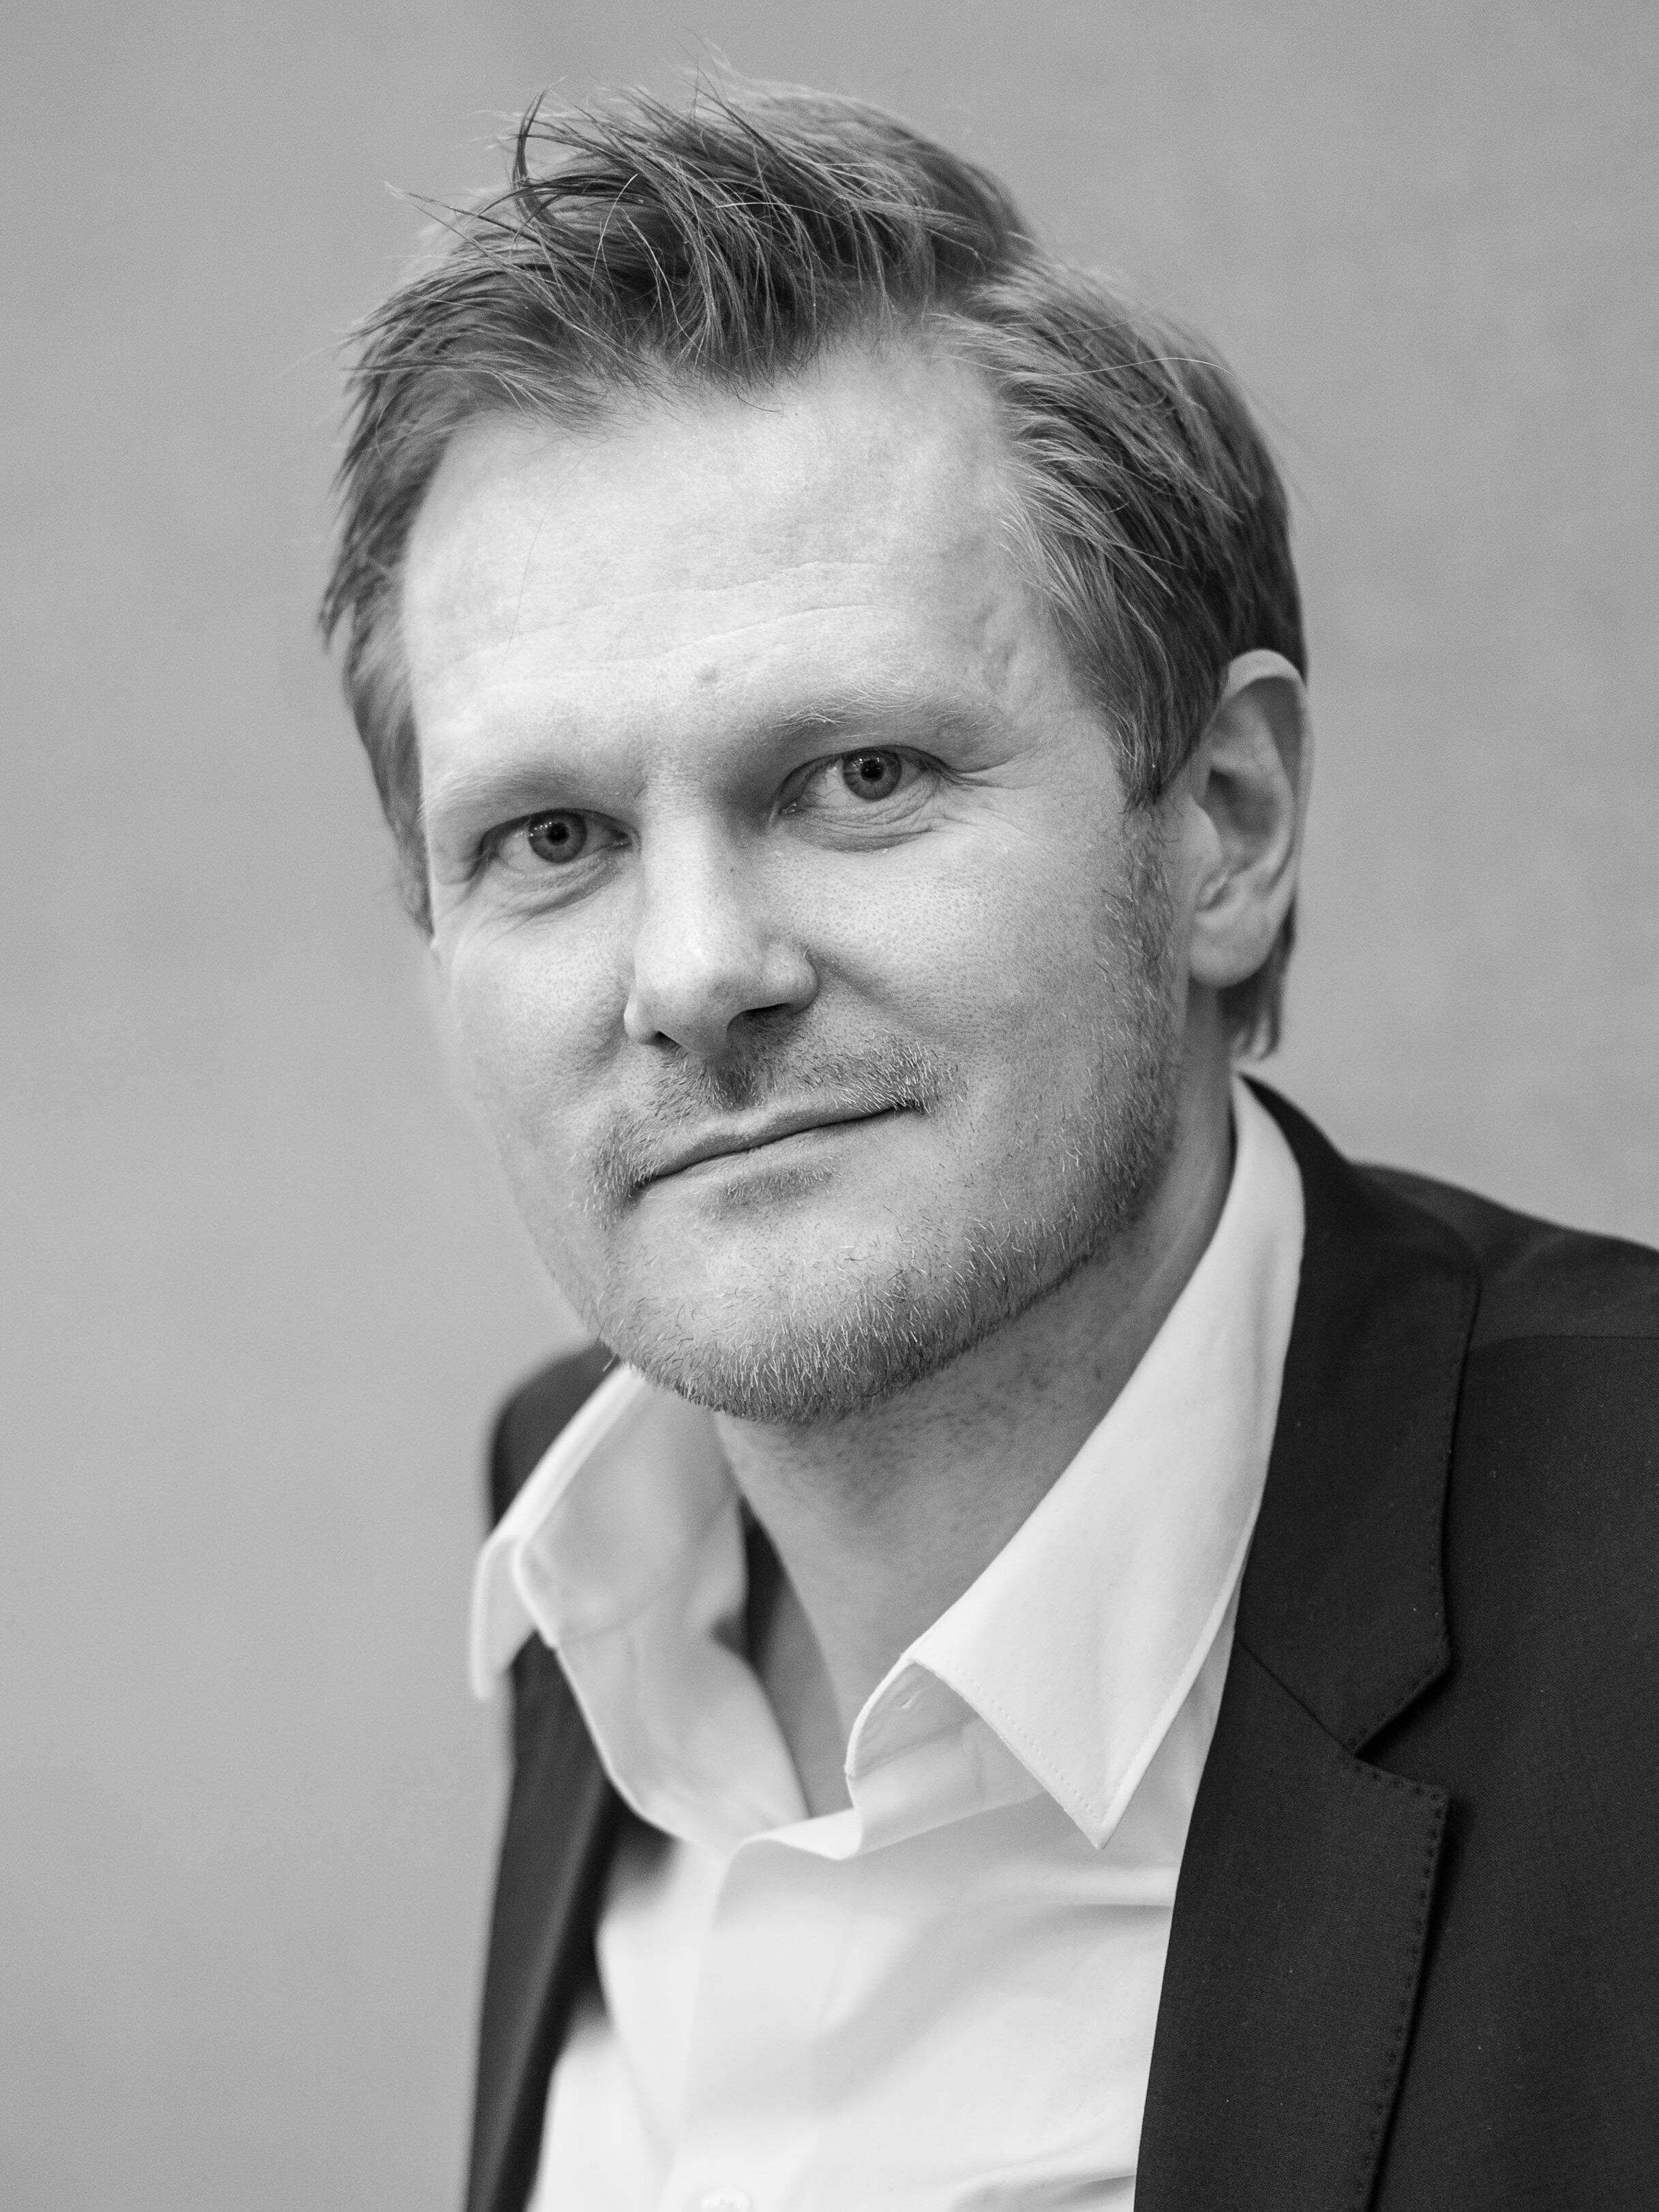 KASPER HOLTEN  DIRECTOR, THE ROYAL DANISH THEATRE  TRACK: CREATIVE MINDS